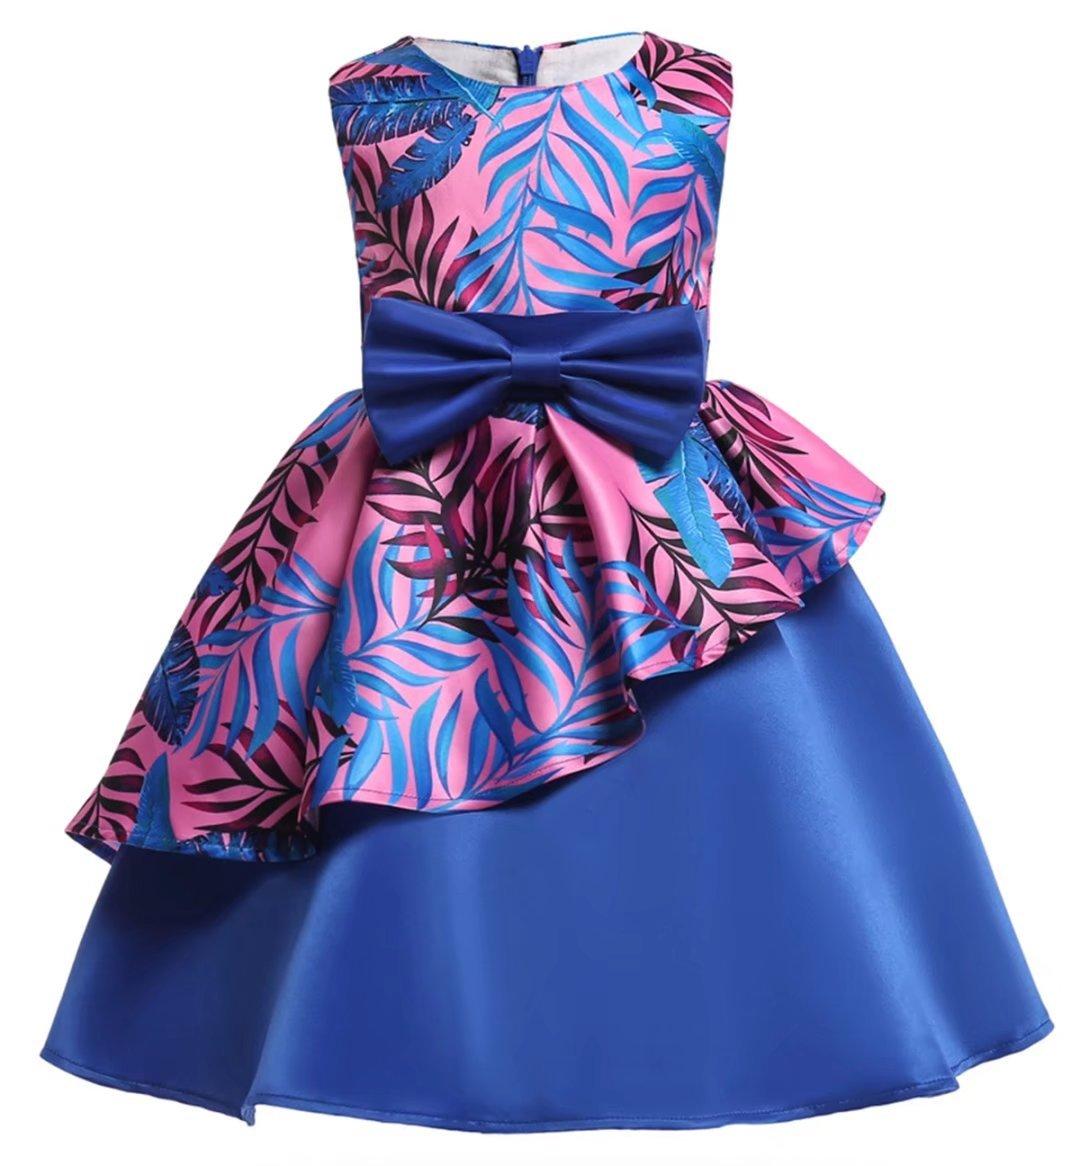 AYOMIS Litter Big Girl Flower Dress Princess Bow Party Wedding Tutu Gowns(Flower-Blue,4-5Y)